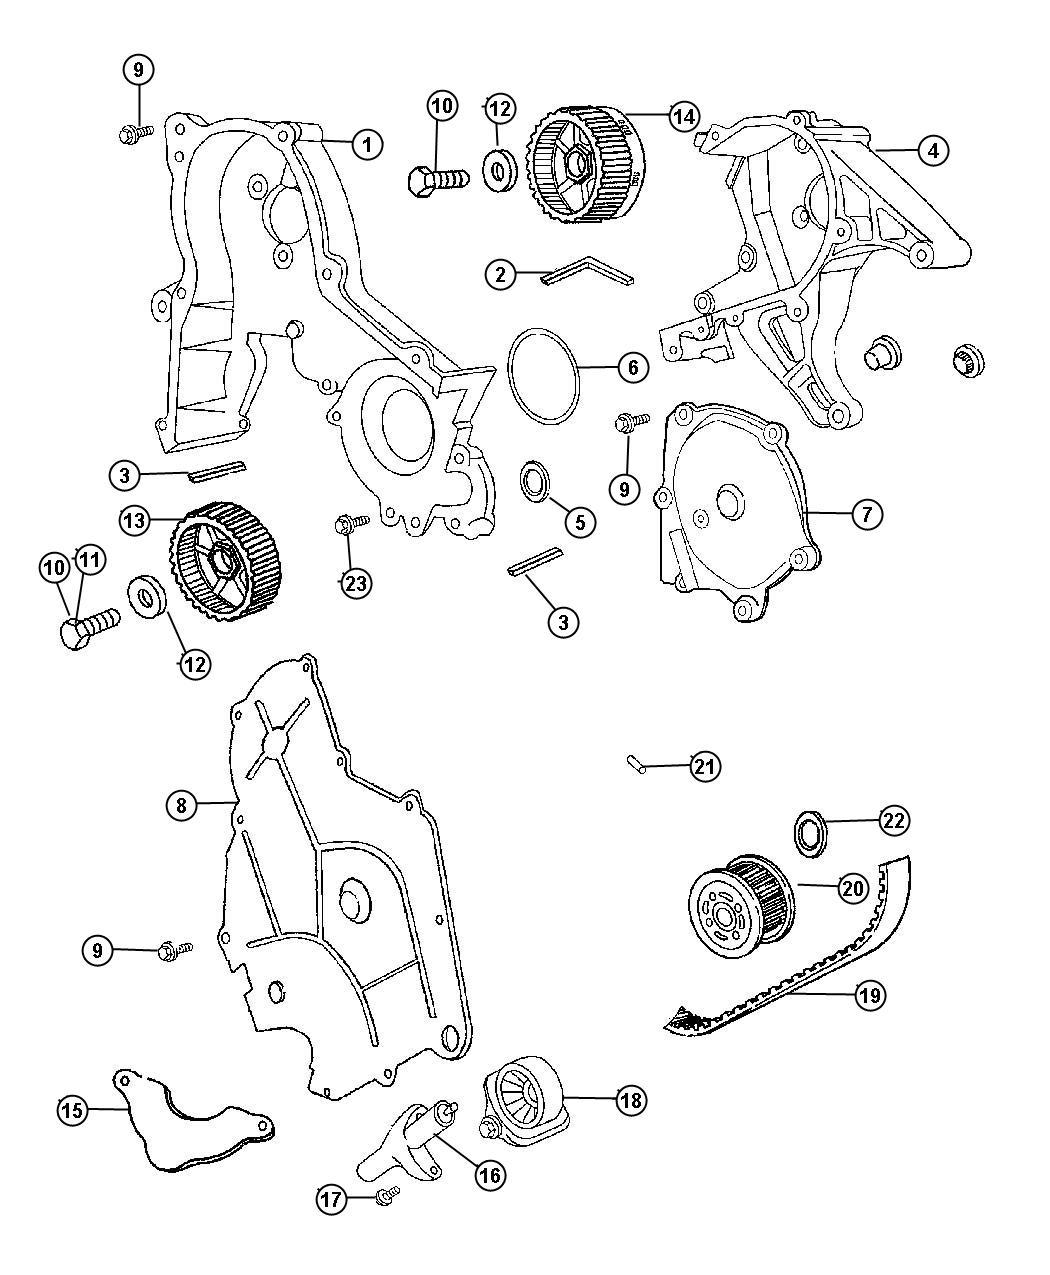 Dodge Intrepid Timing Belt And Cover 3 2l Engine